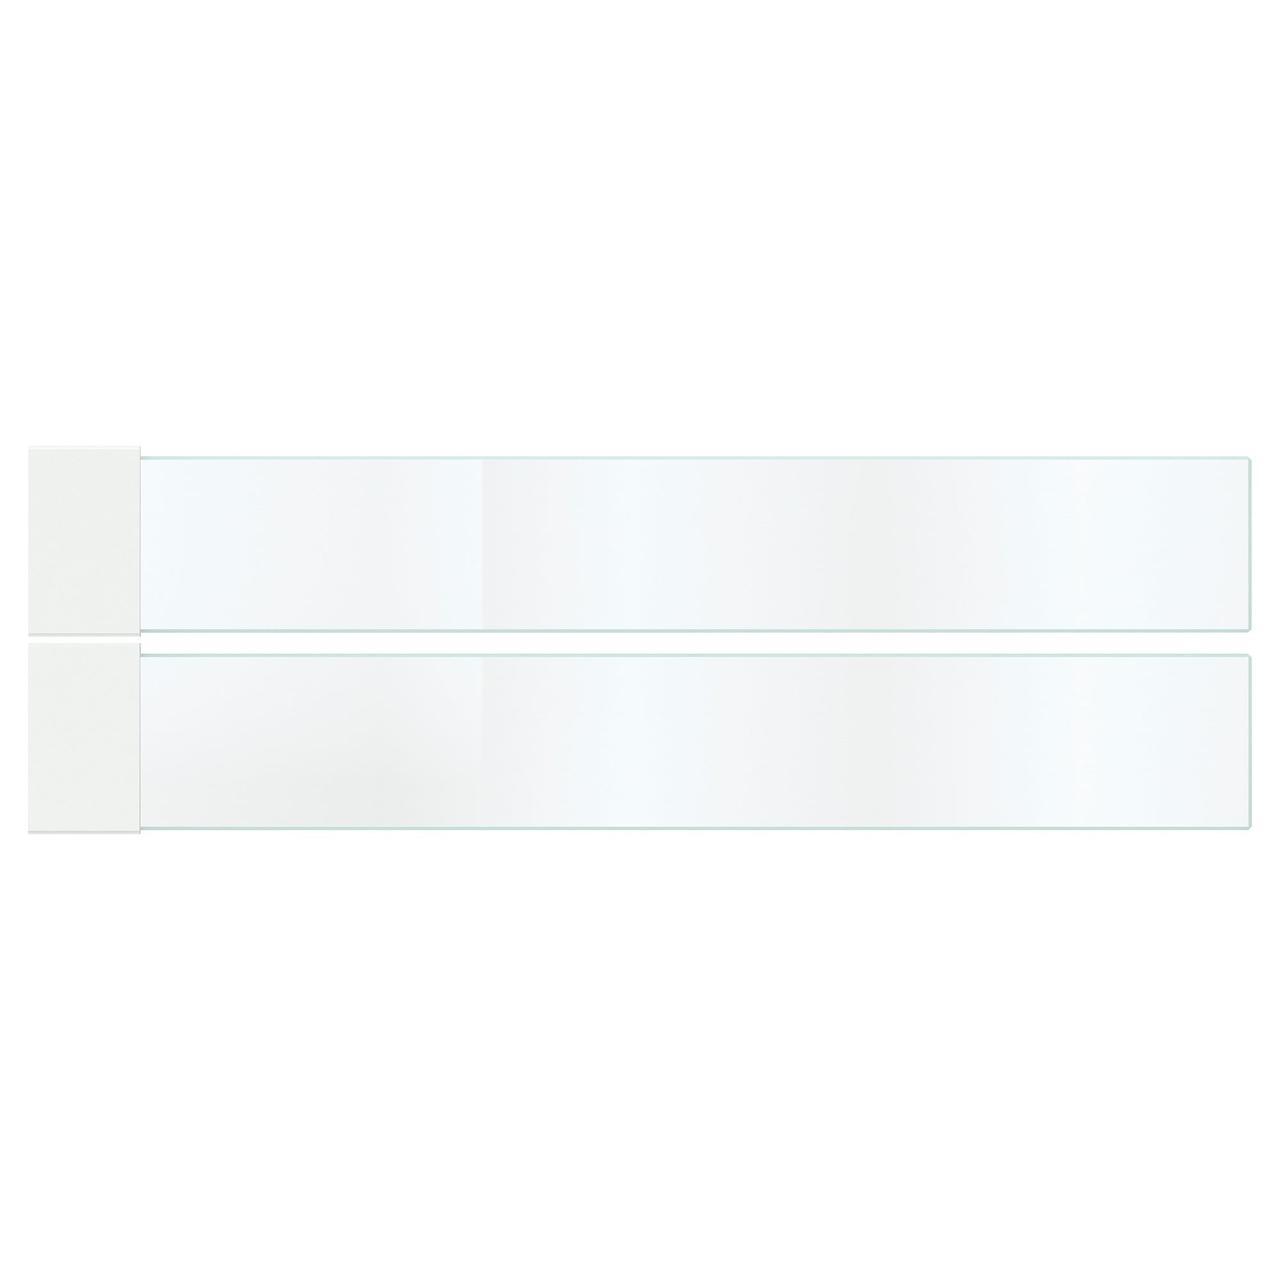 МАКСИМЕРА Дополнит боковина д/ящика, средняя, стекло